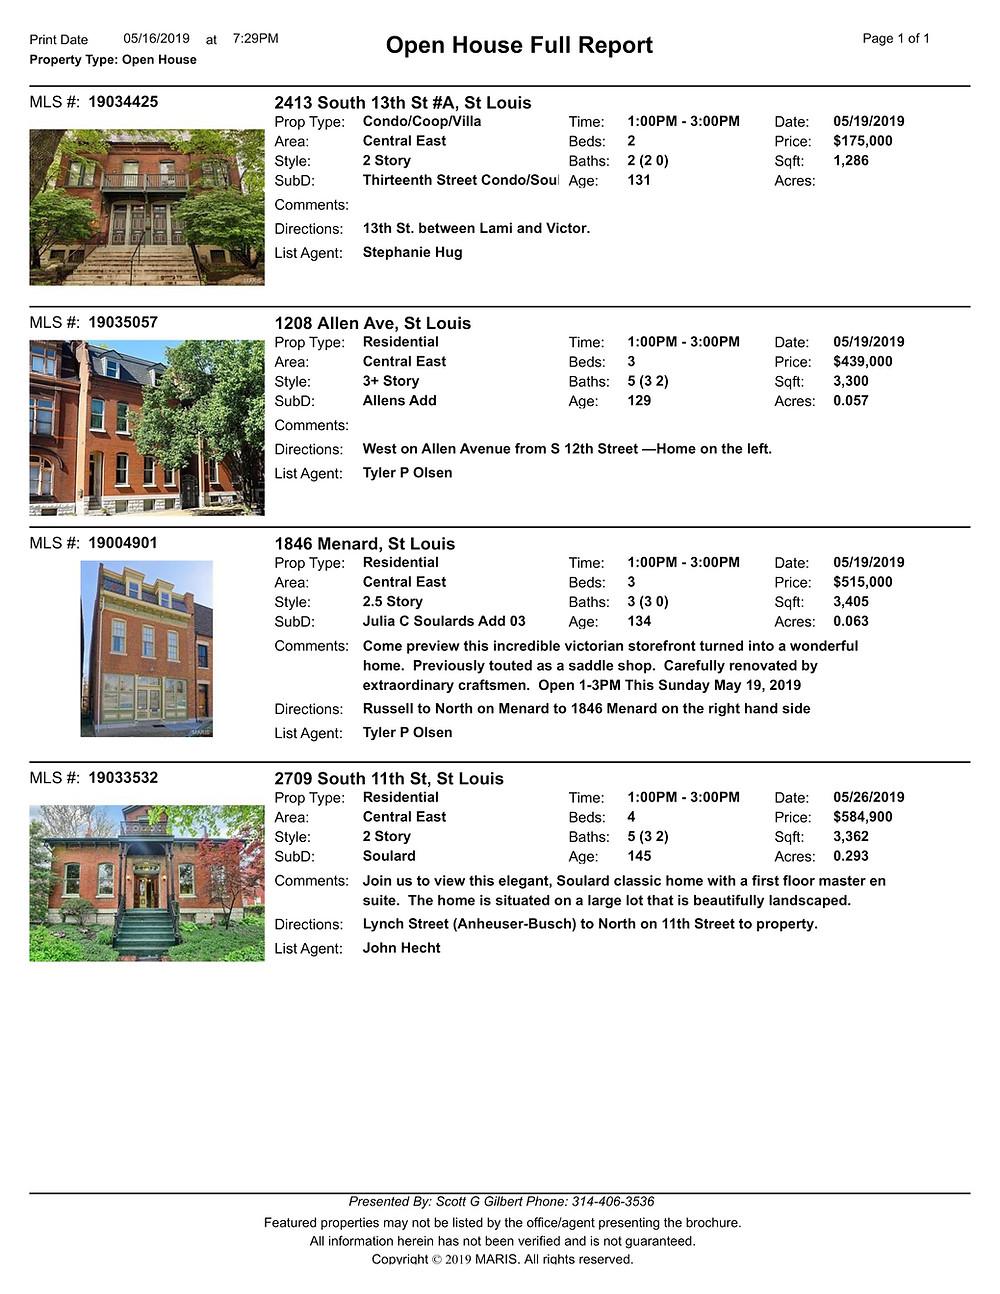 St Louis Open Houses